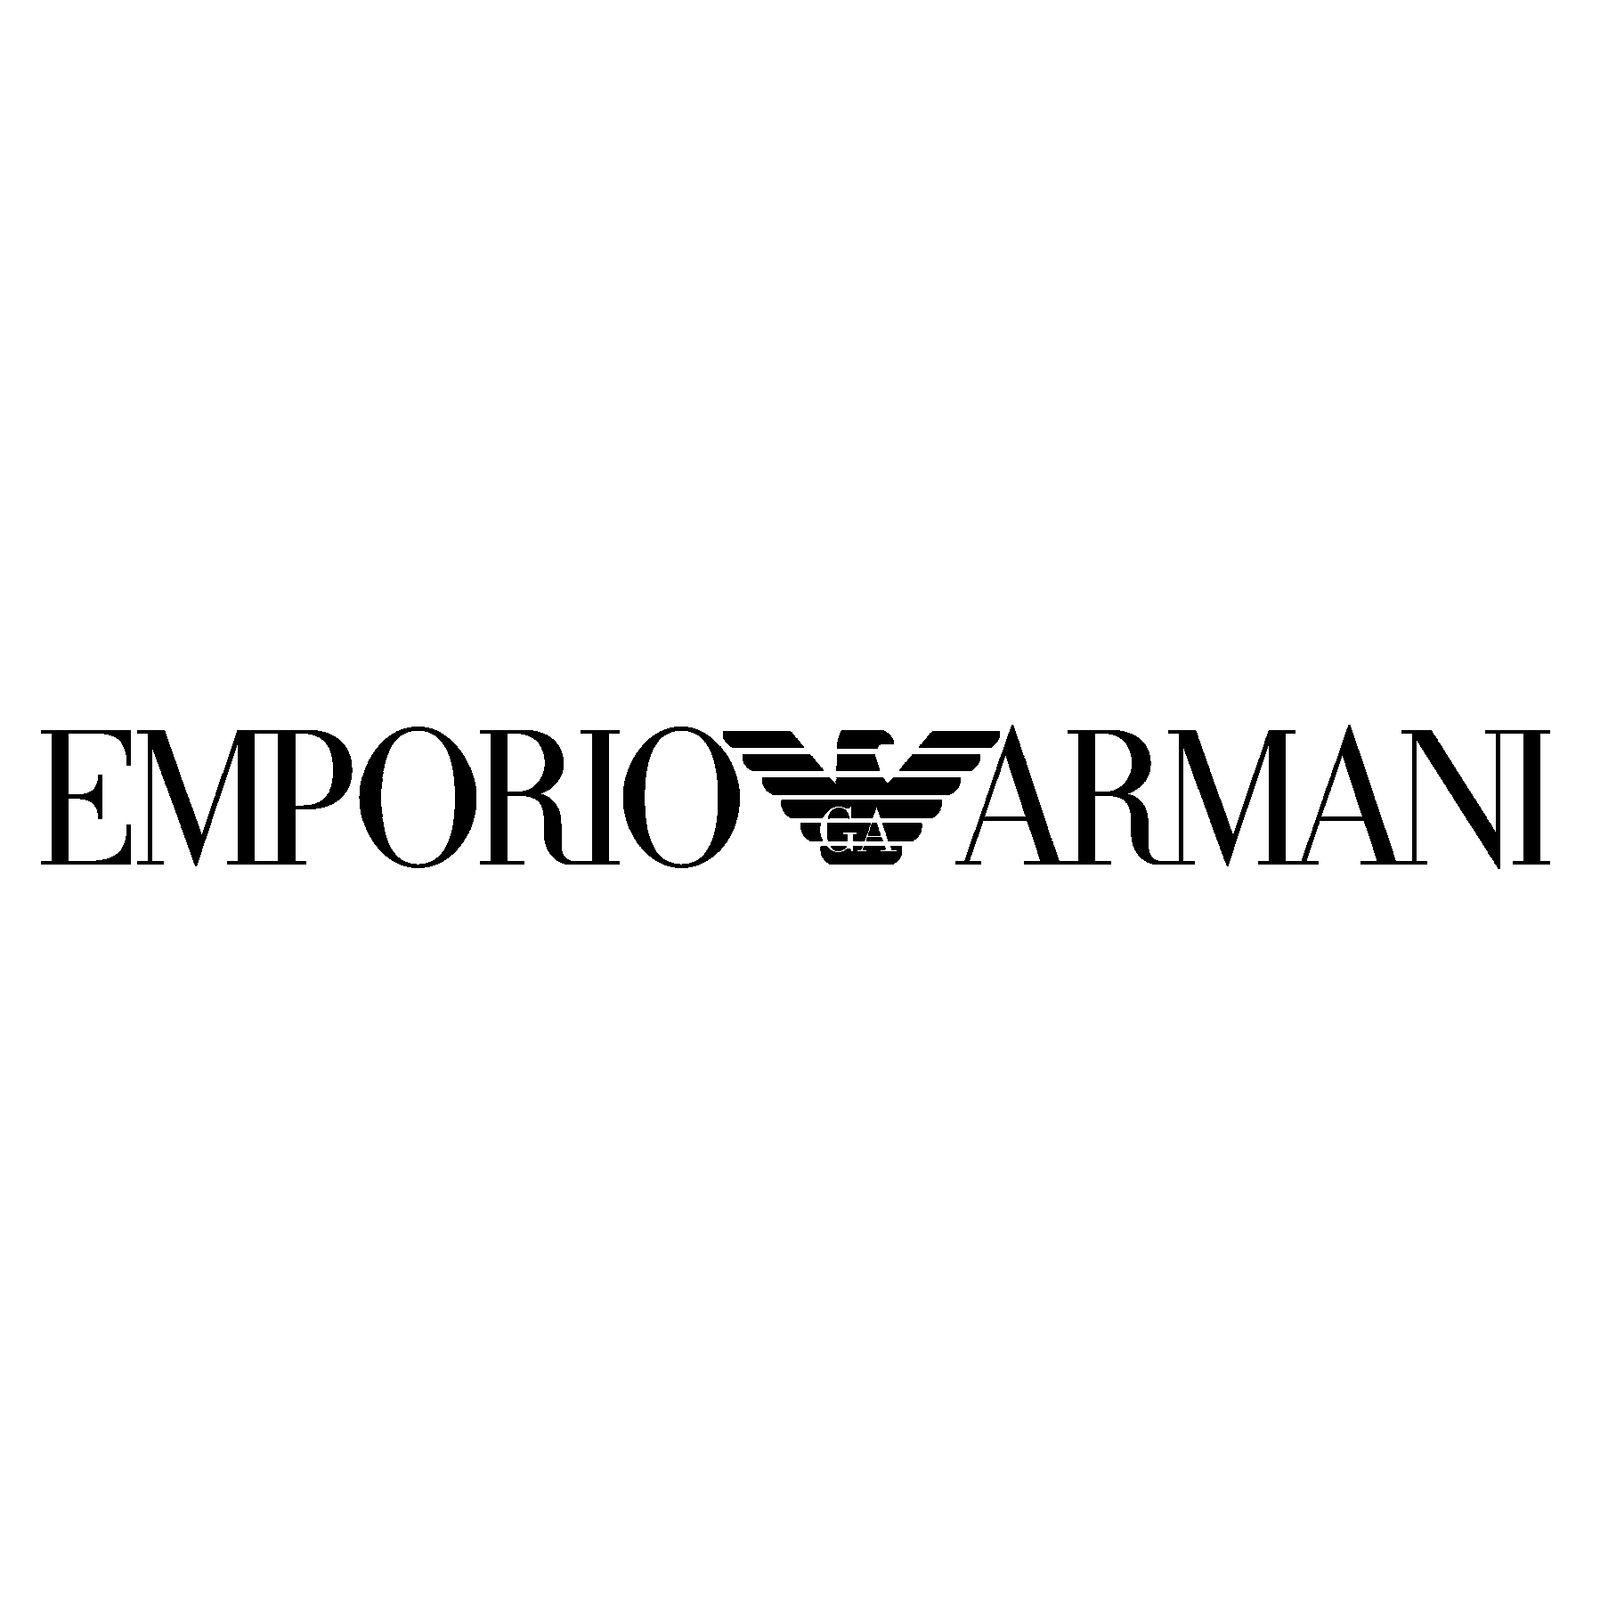 EMPORIO ARMANI (Bild 1)